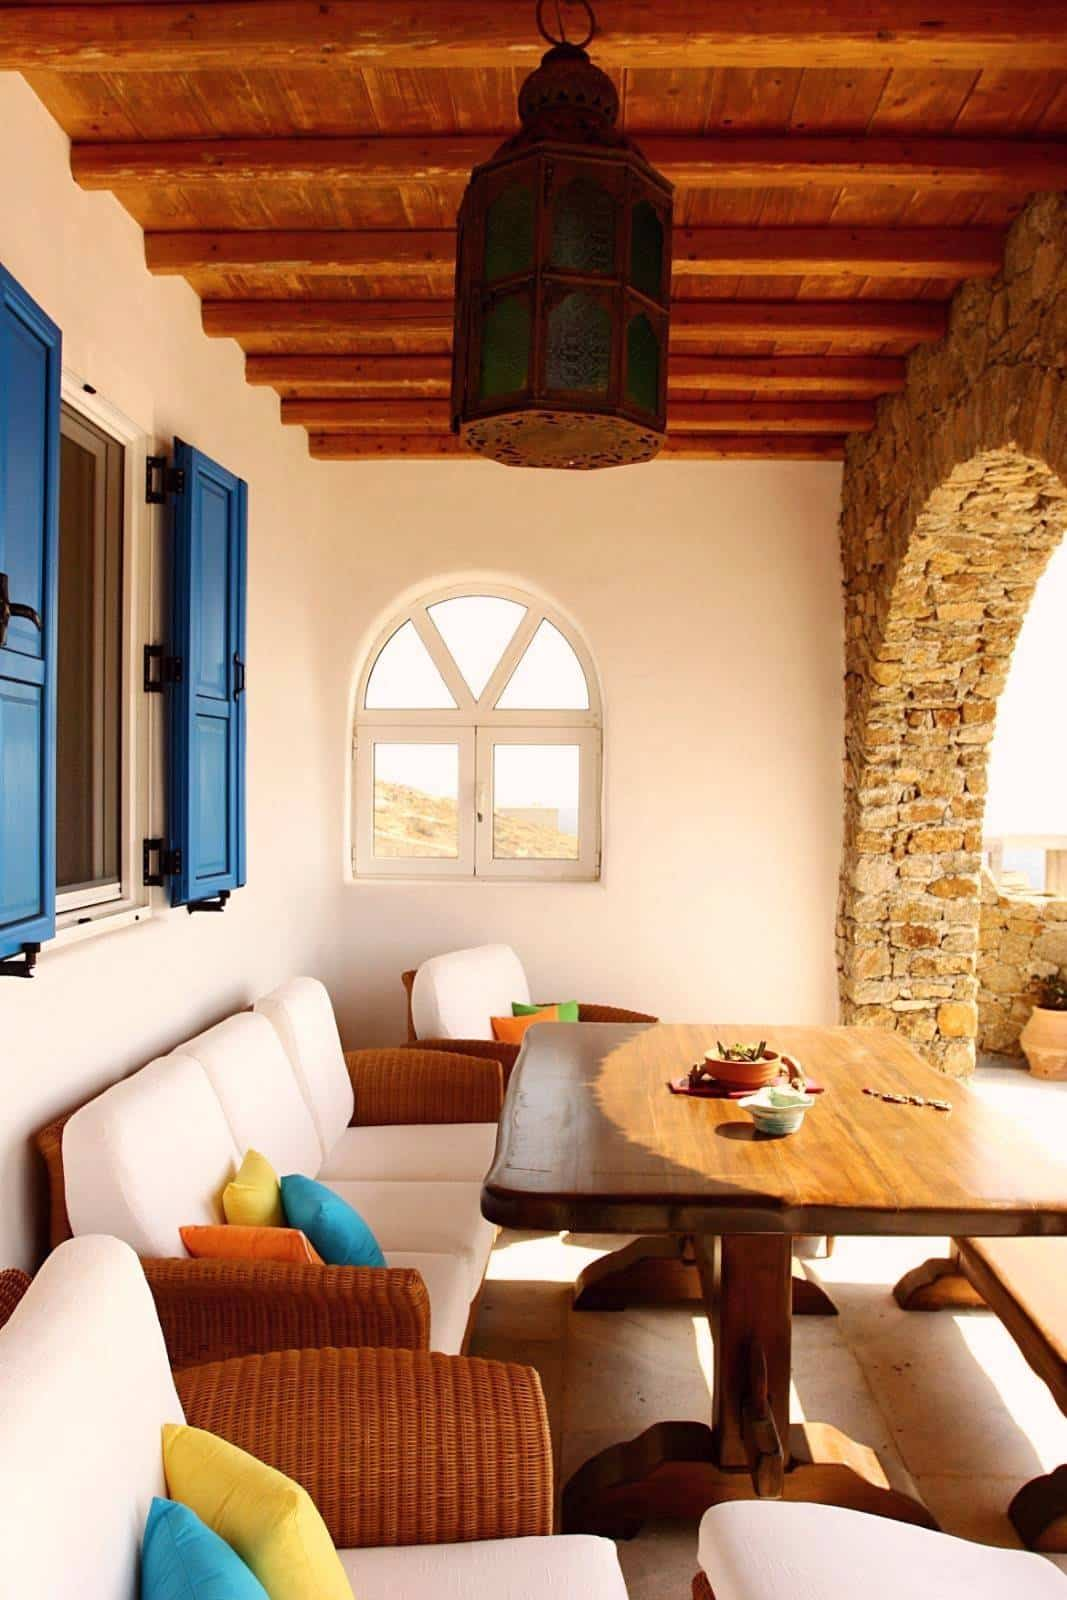 luxurious villa Mykonos - πολυτελής βίλα Μύκονος - mykonos services - οικοδομικές εργασίες 24